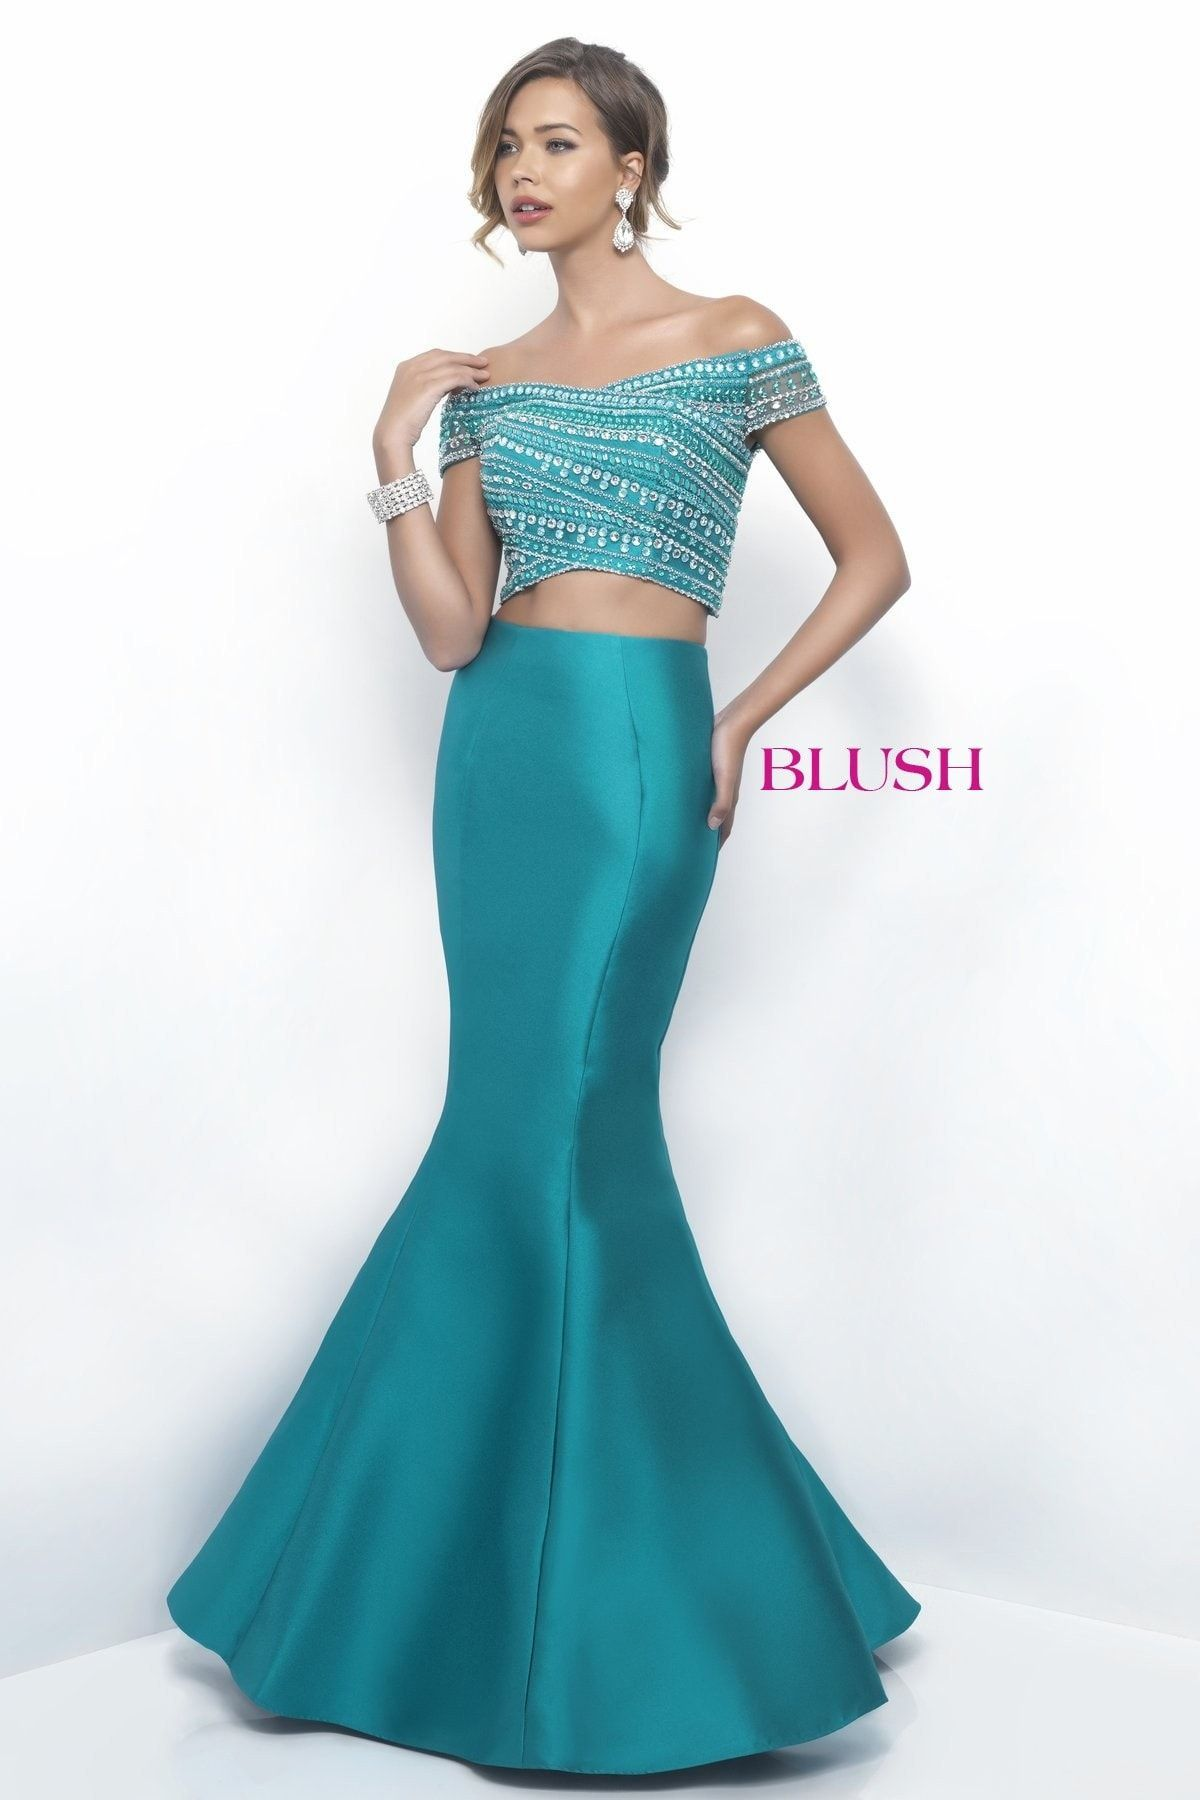 Blue and green prom dress  Blush Prom  Jade TwoPiece Prom Dress  Senior prom  Pinterest